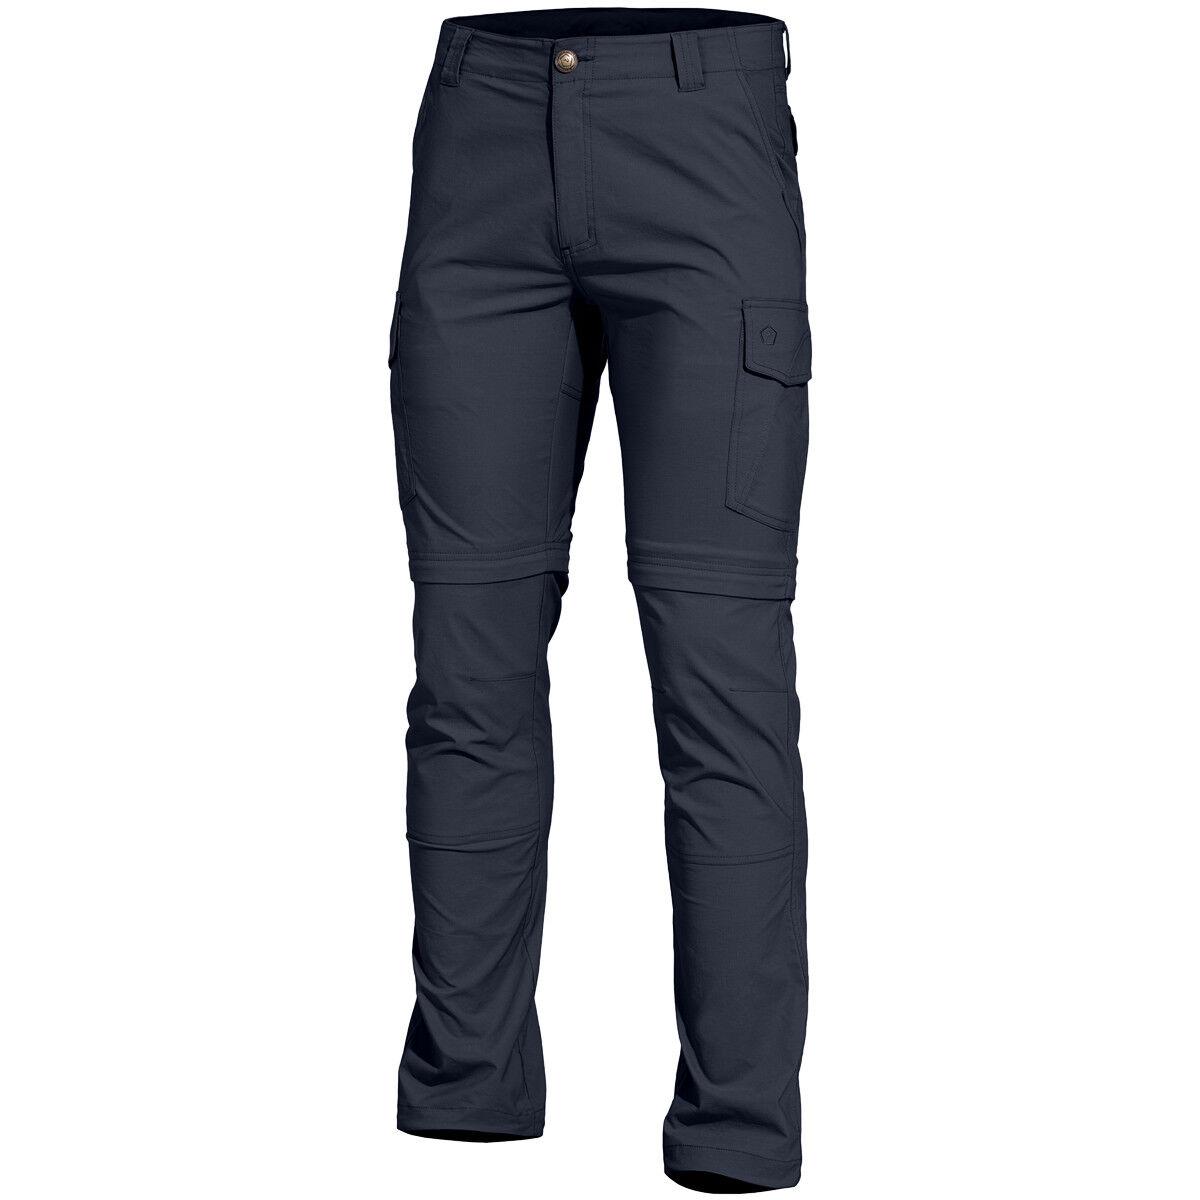 Pentagon Gomati XTR Pants Mens Zip Off Legs Outdoor Uniform Army Midnight bluee